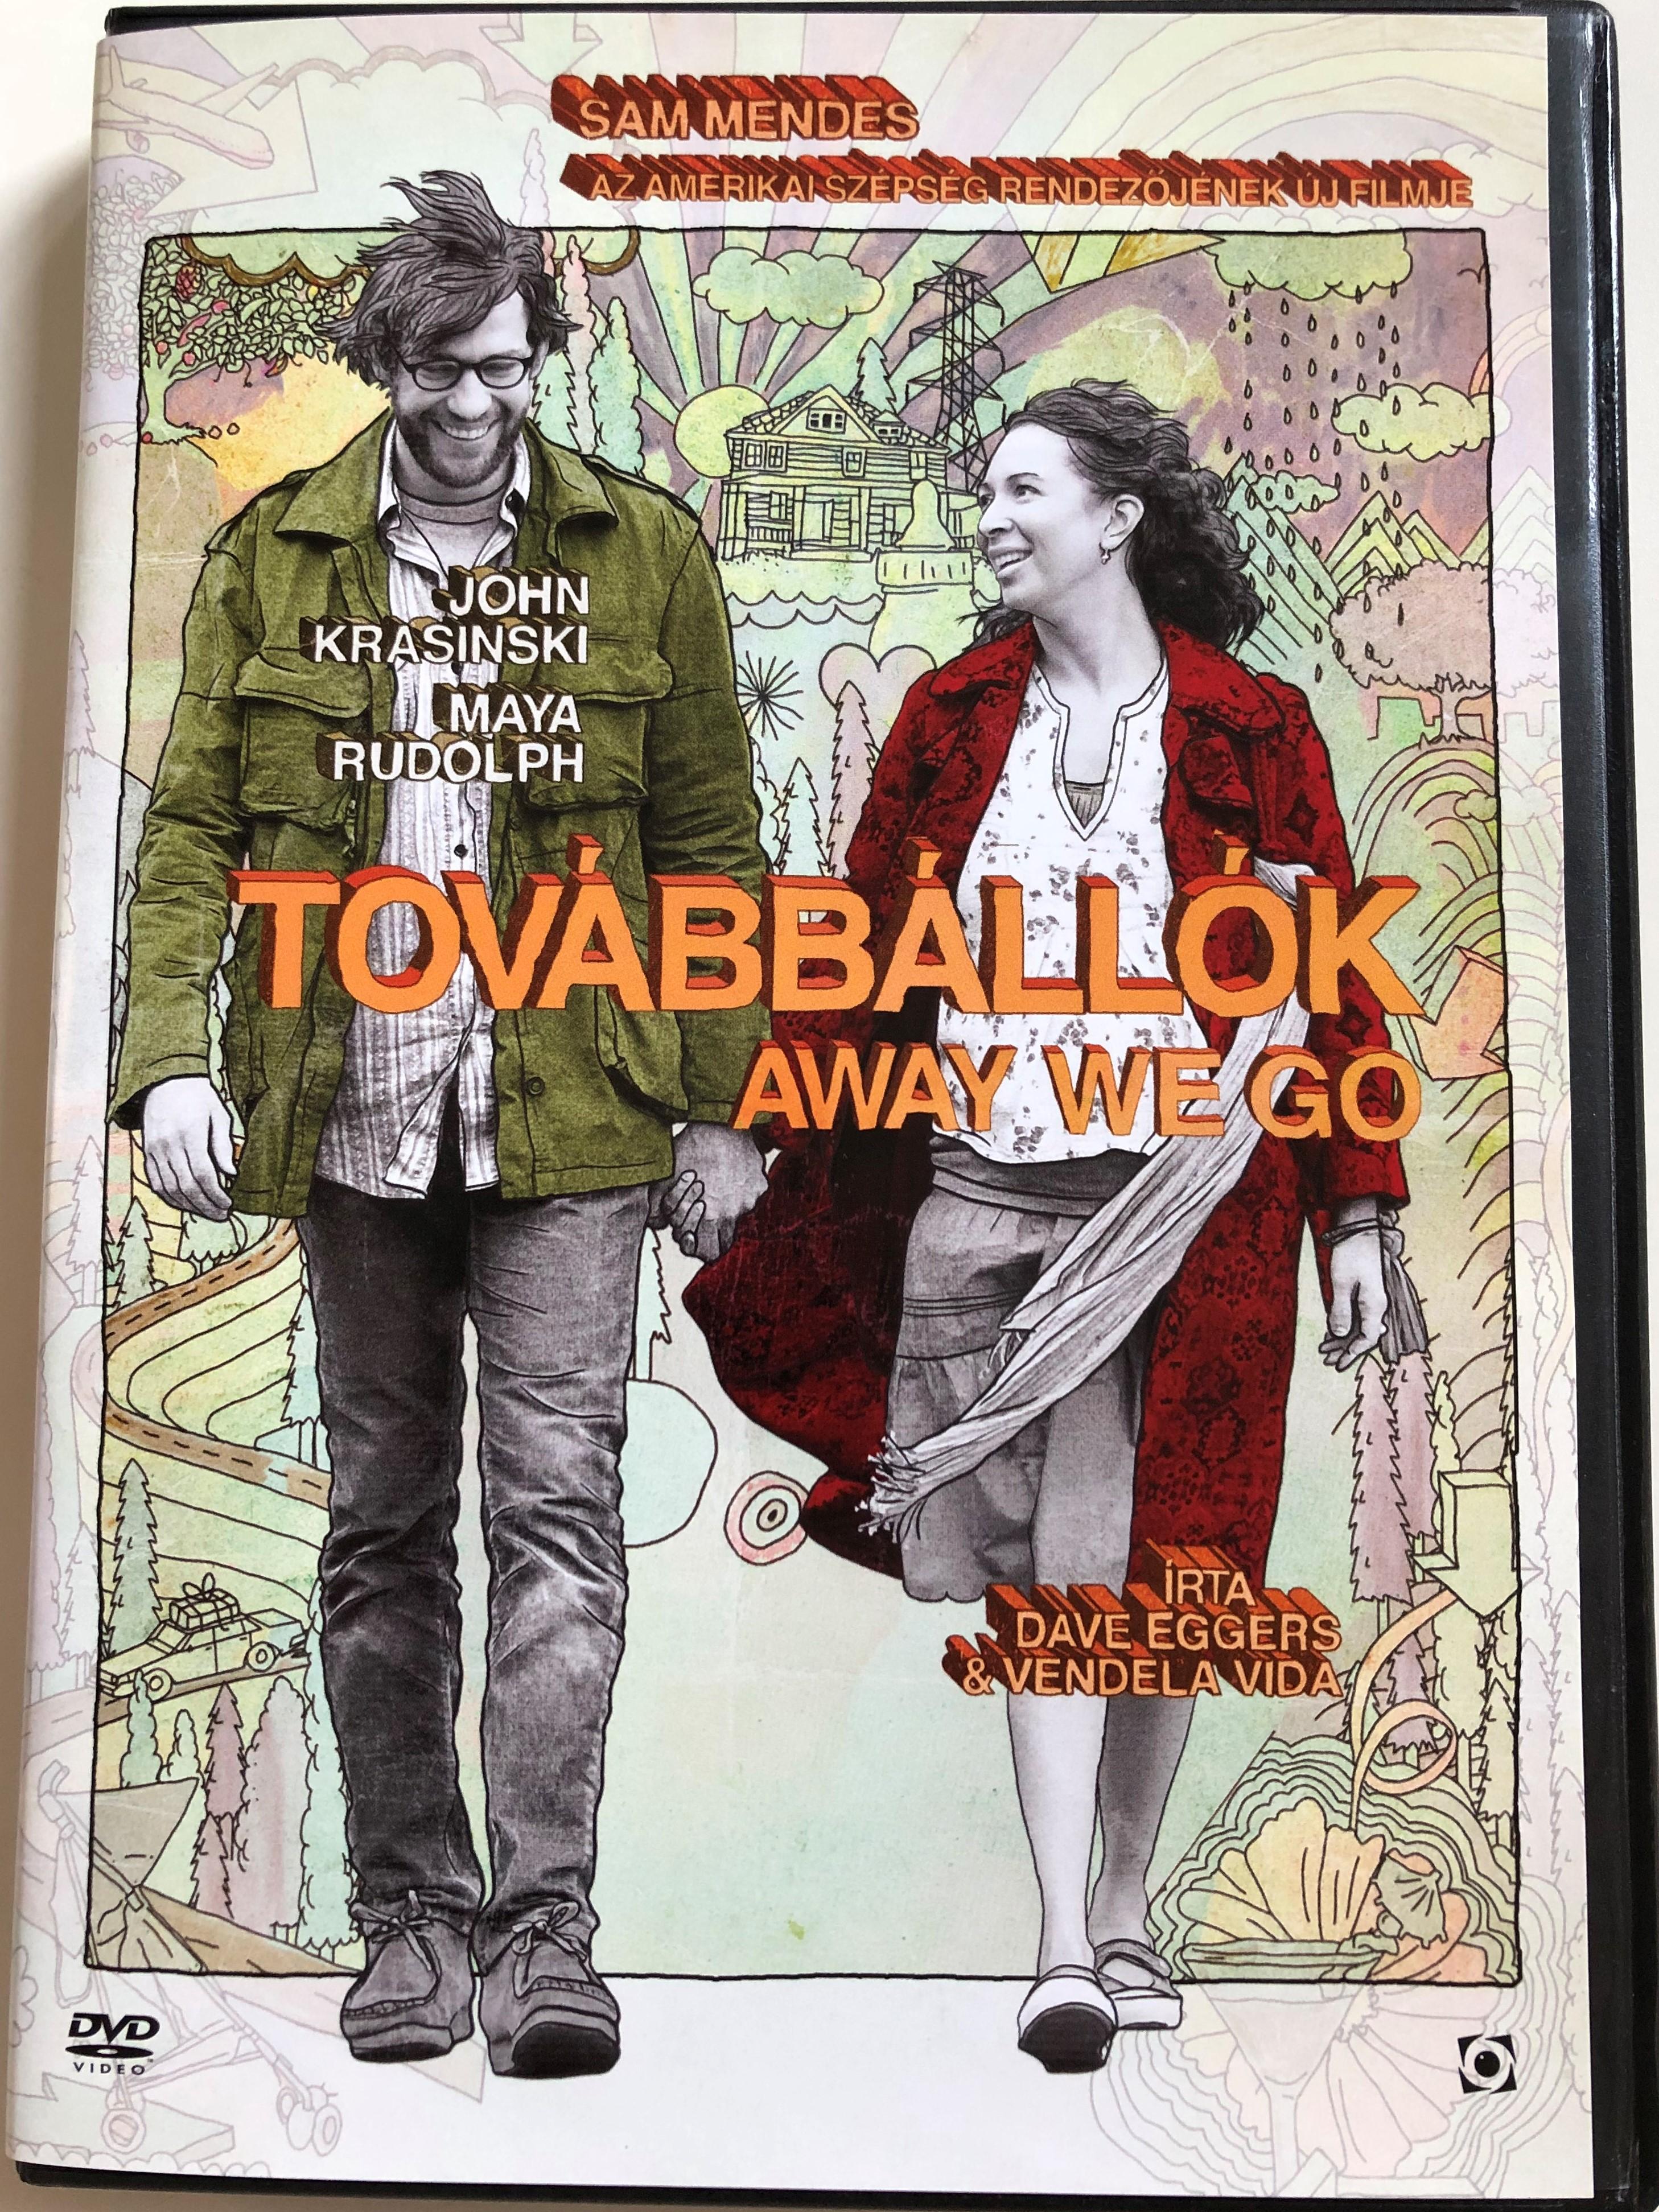 away-we-go-dvd-2009-tov-bb-ll-k-directed-by-sam-mendes-1.jpg